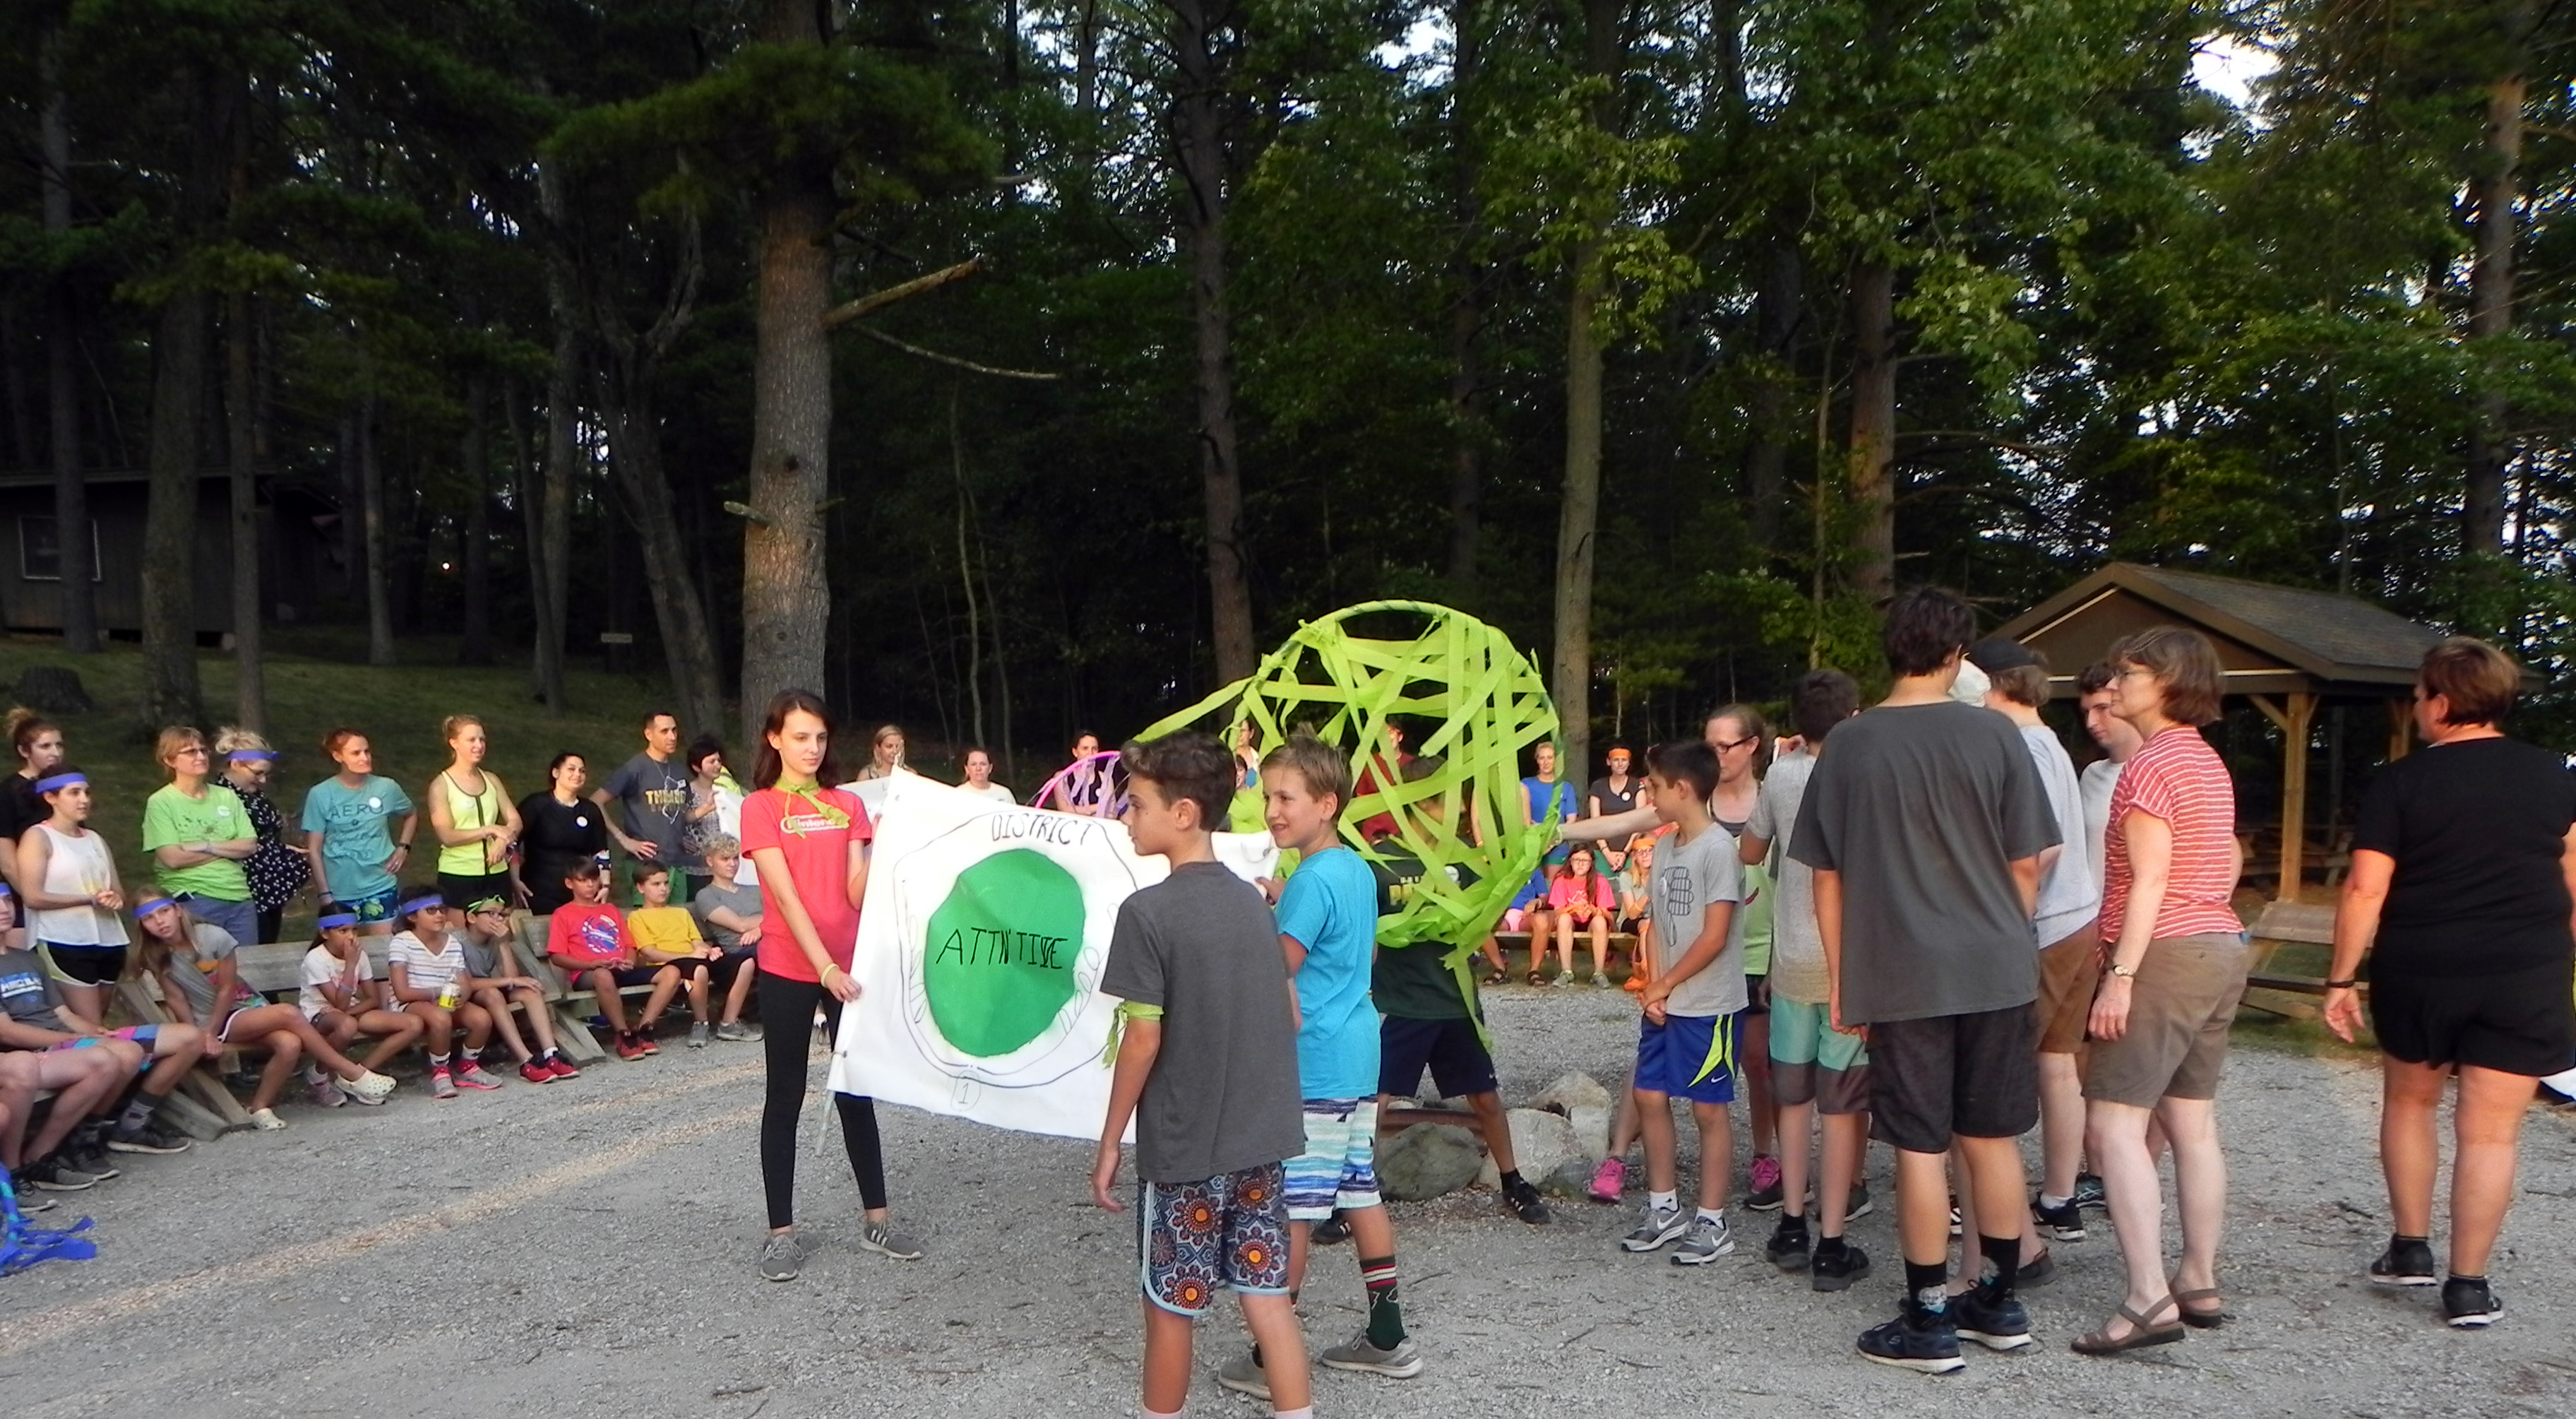 Campers presenting